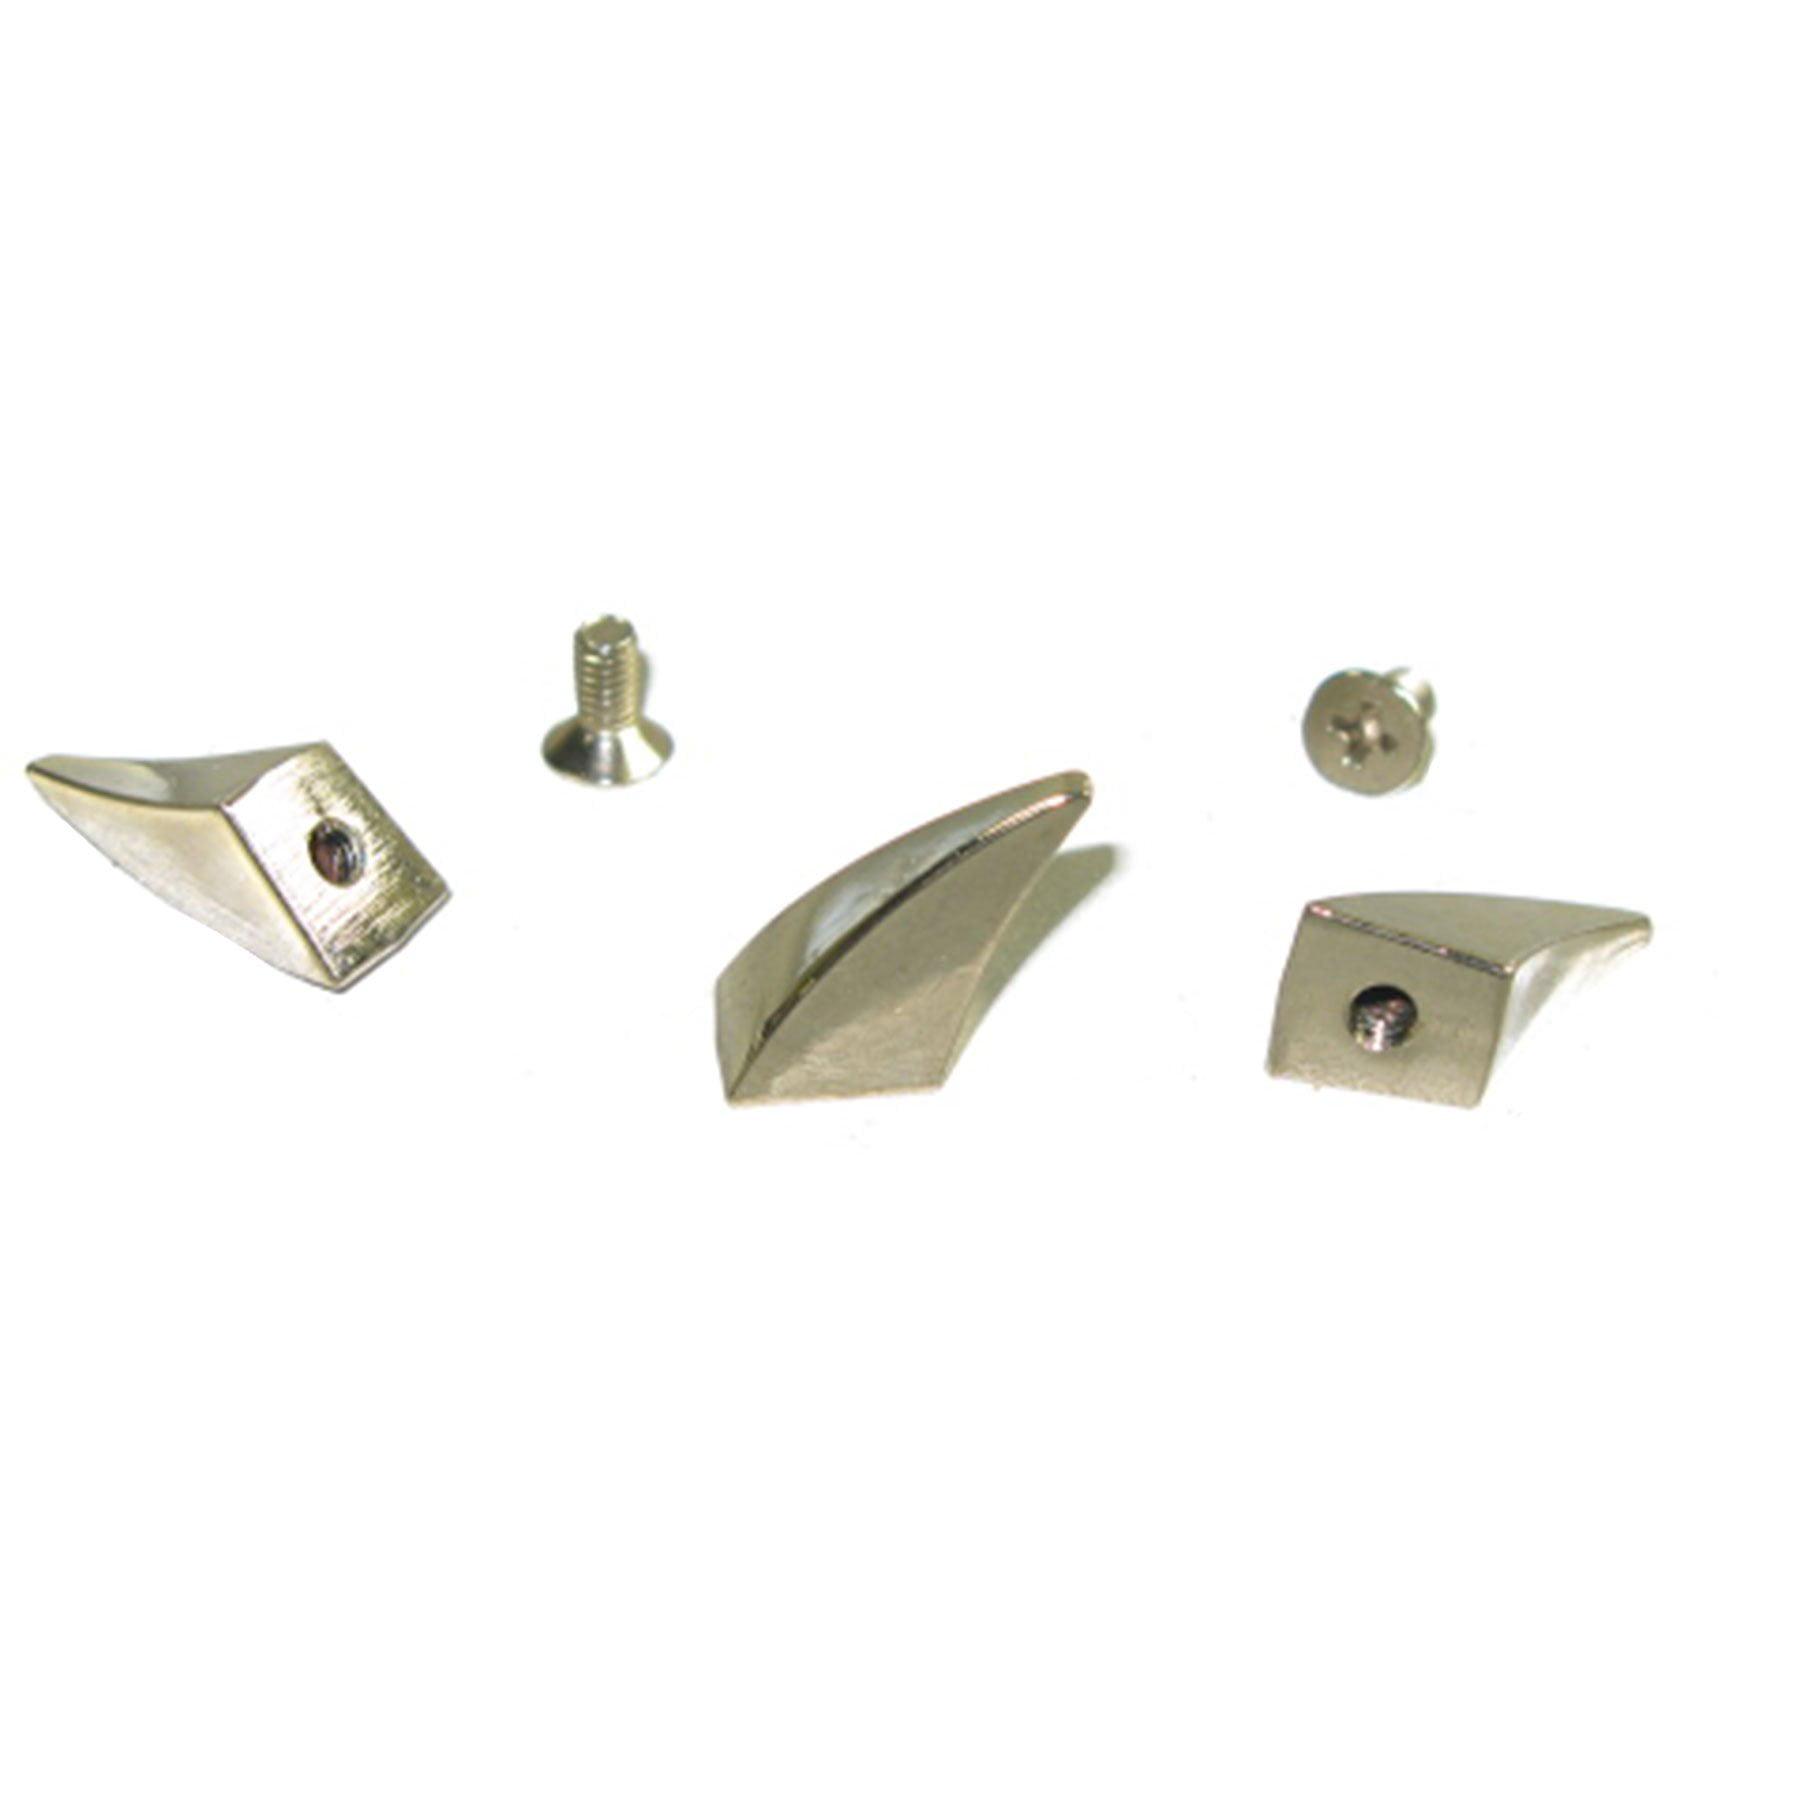 Claw Spike Nickel Studs Screwback Attachment Leathercraft Metal Spot - 2 Sizes - image 1 de 1